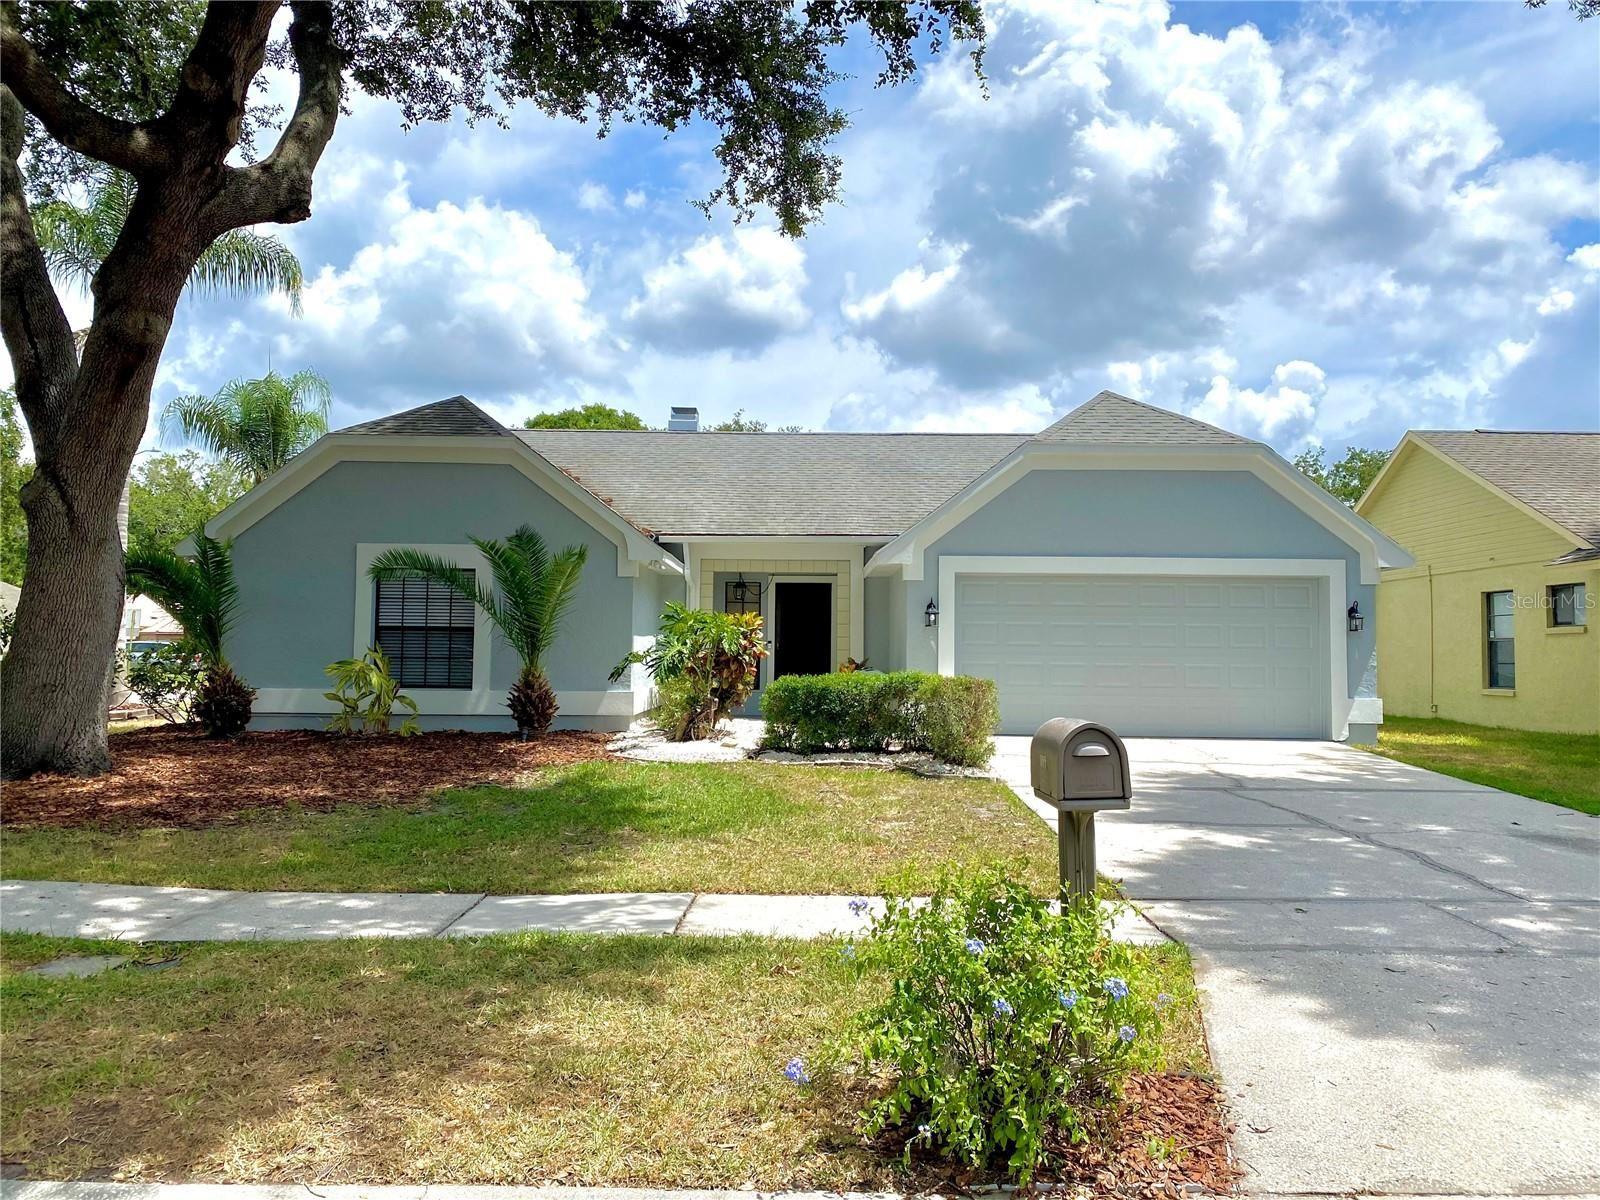 9406 PEBBLE GLEN AVENUE, Tampa, FL 33647 - MLS#: T3311148